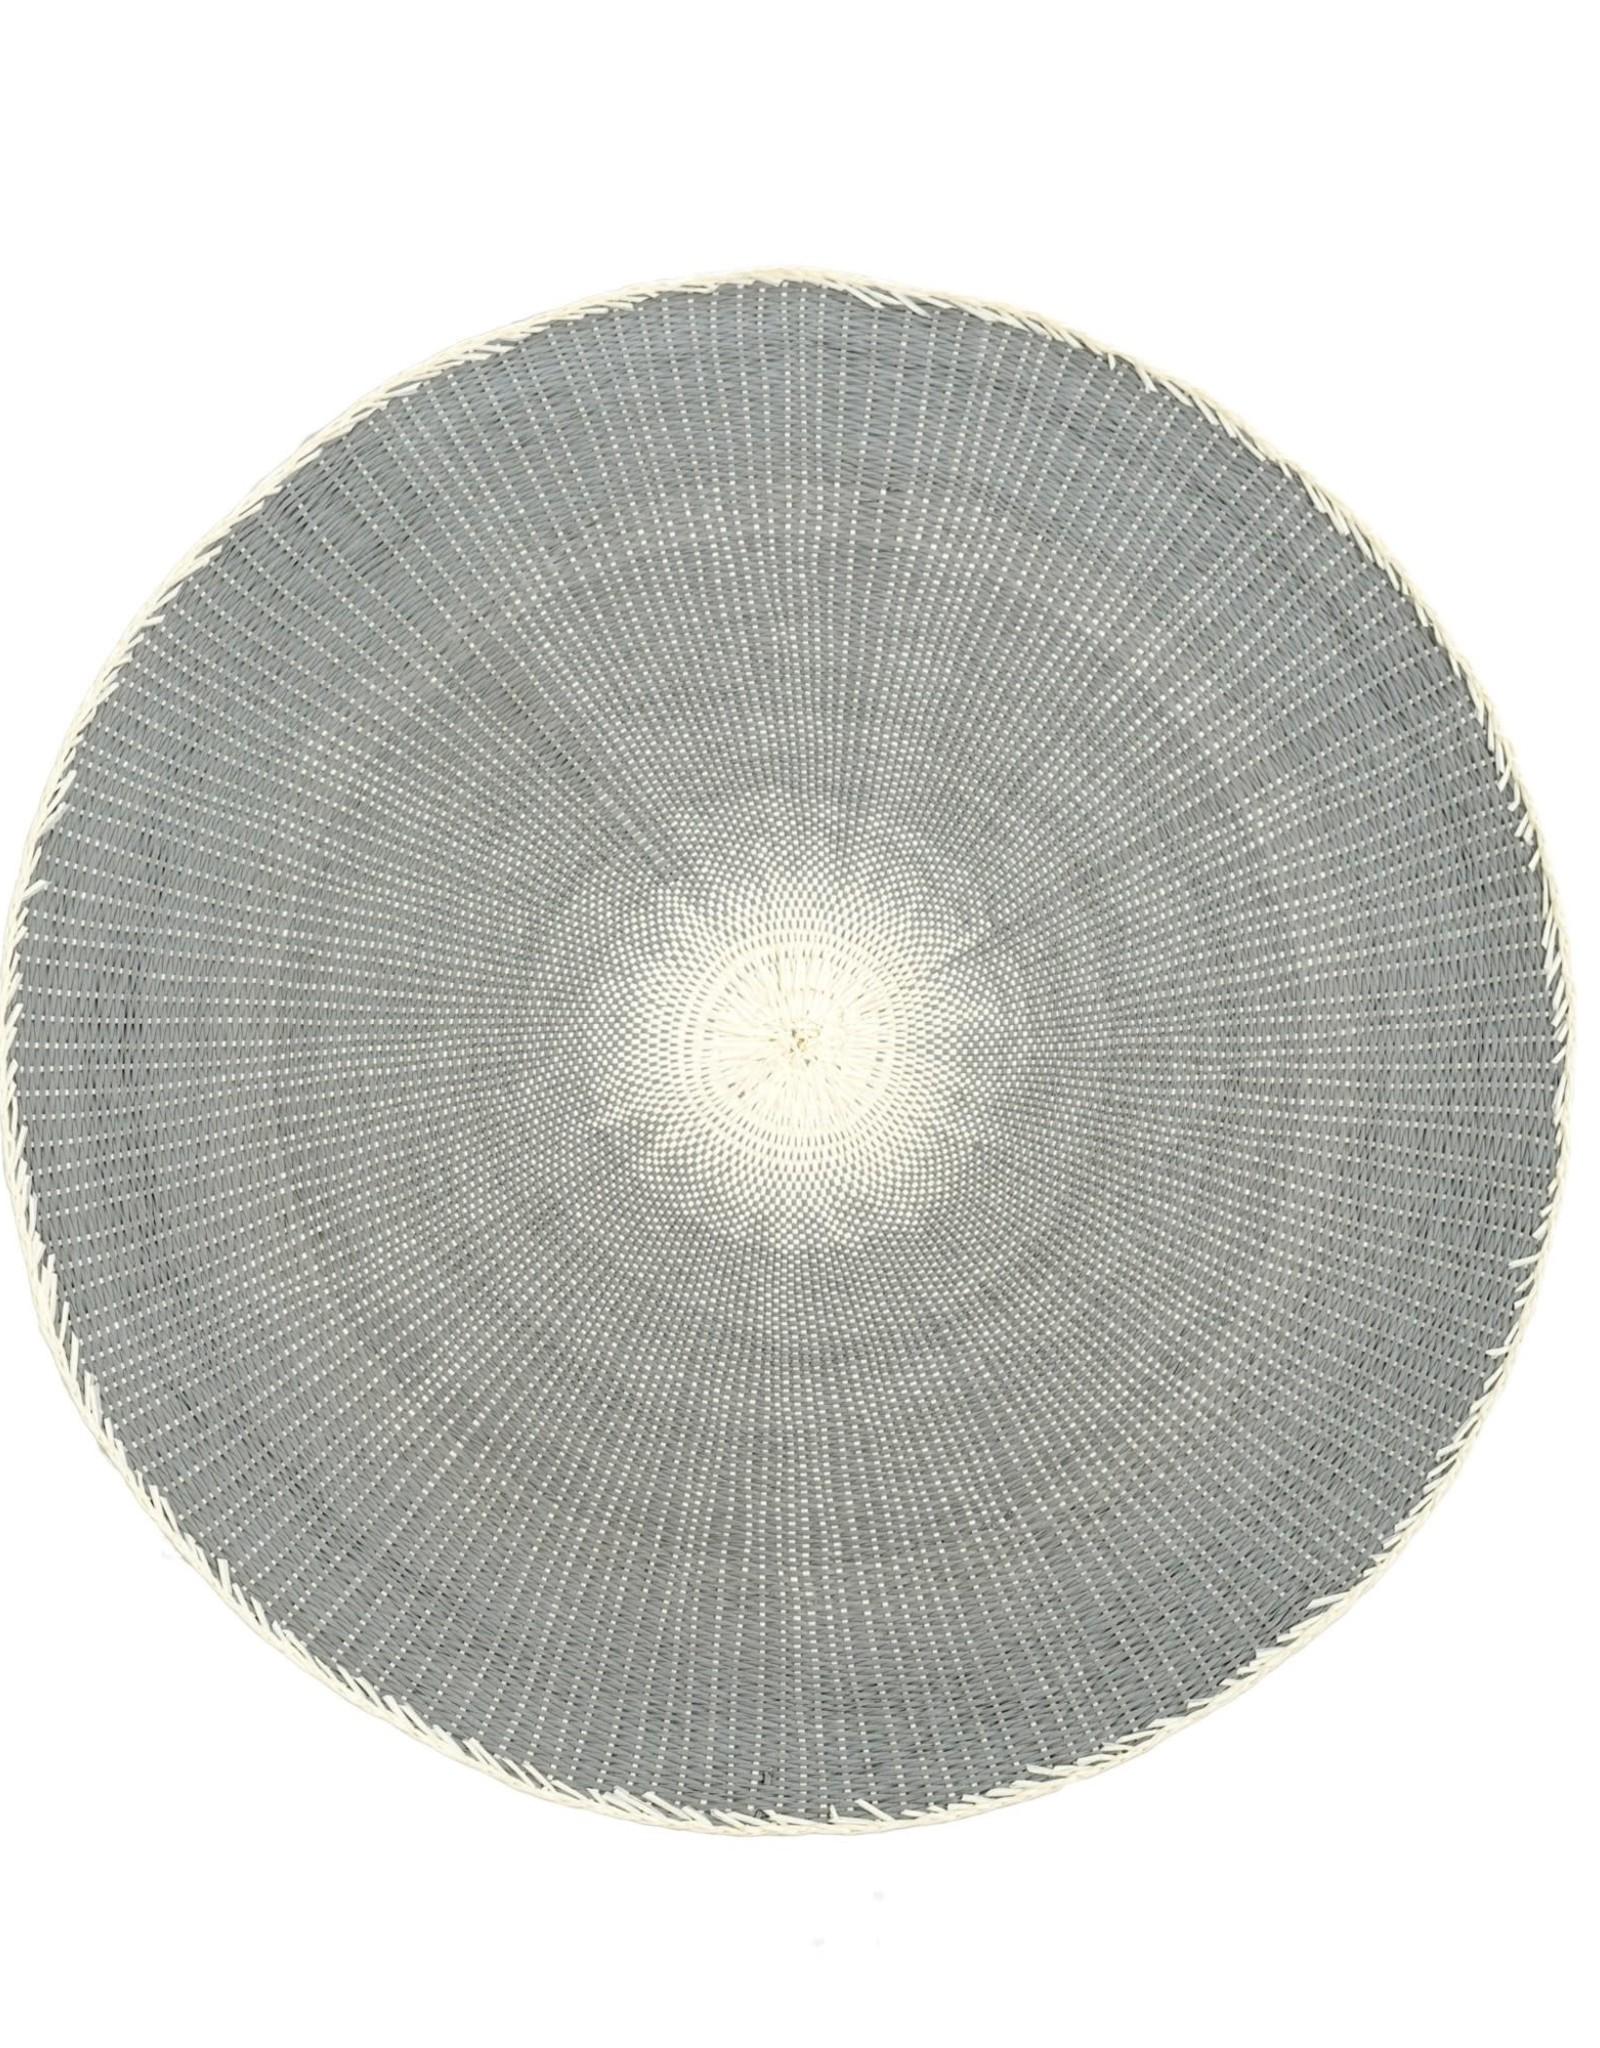 Indaba Willa Placemat - Stone